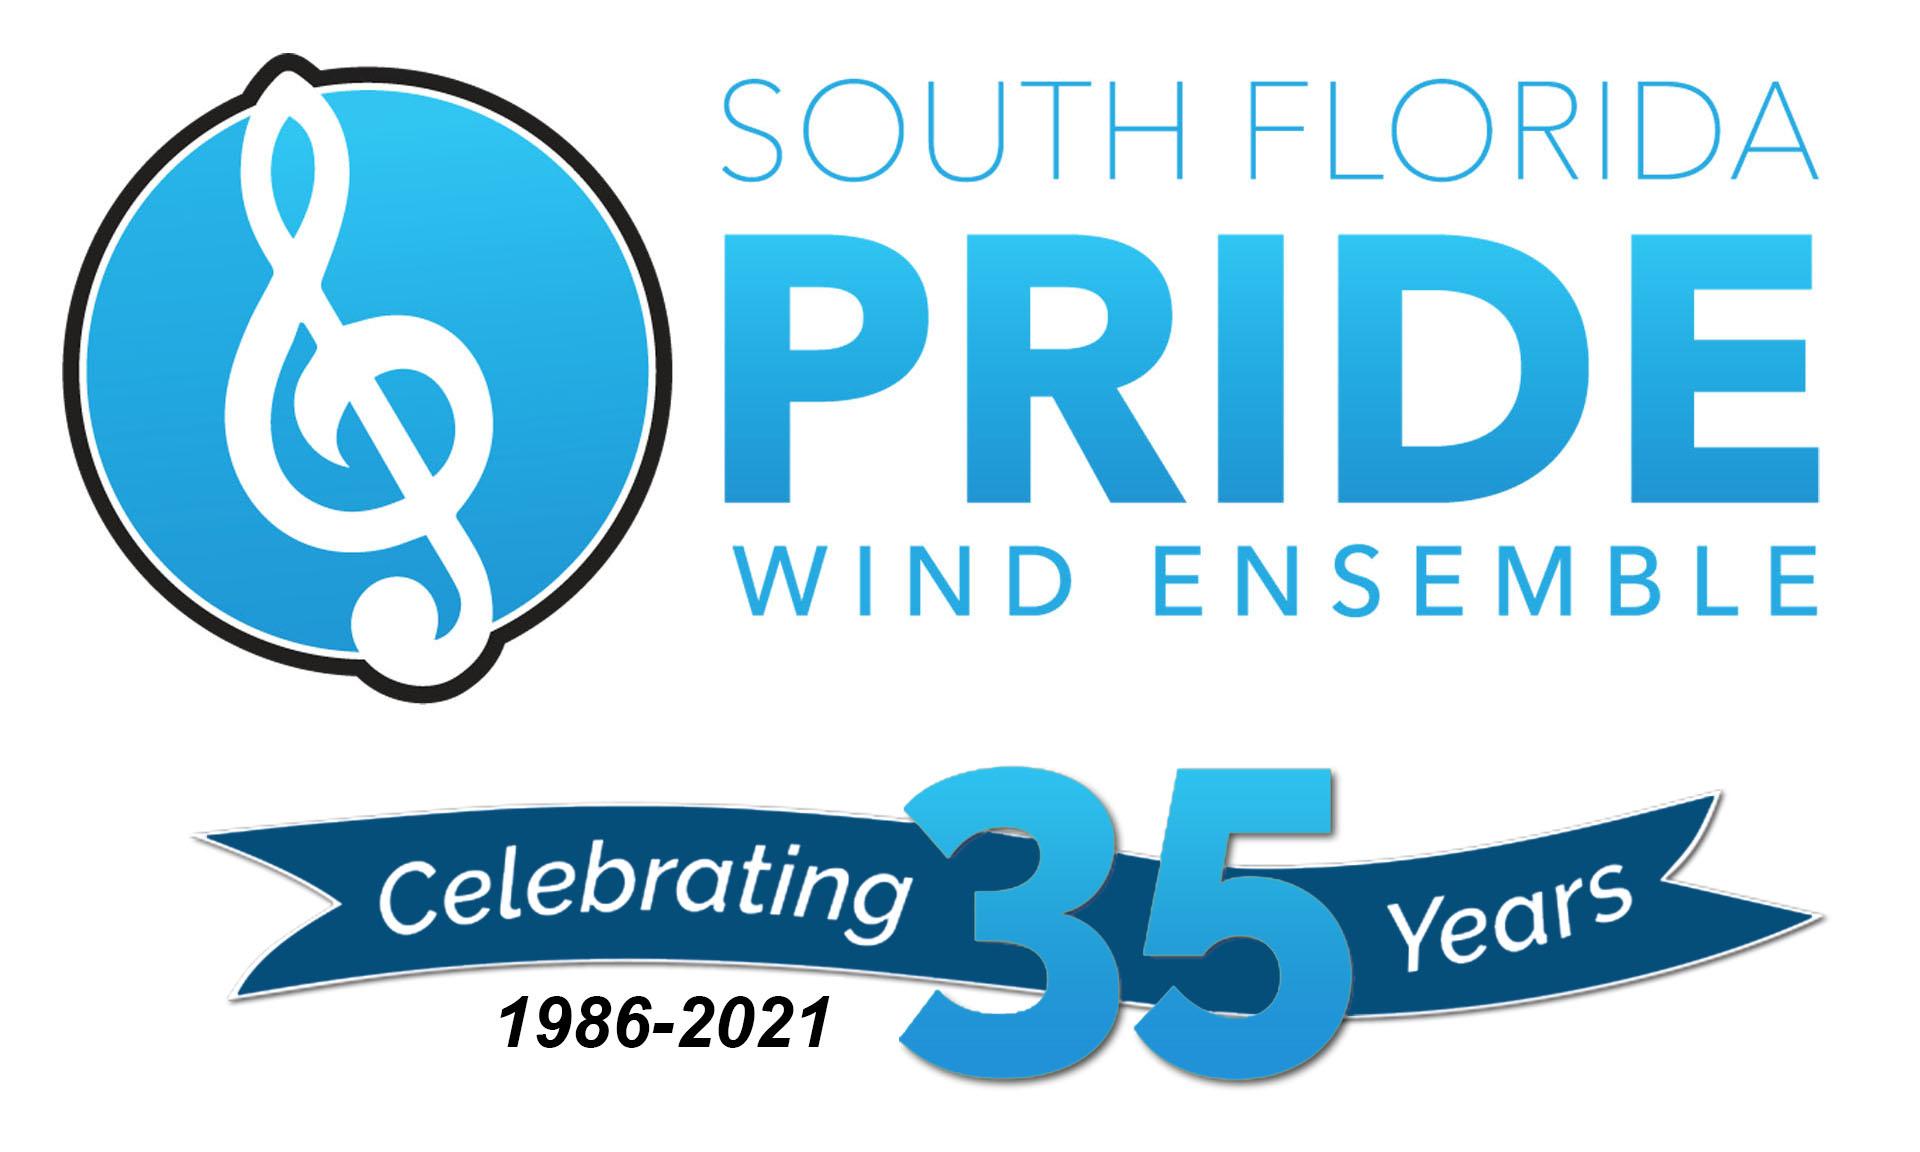 South Florida Pride Wind Ensemble concert